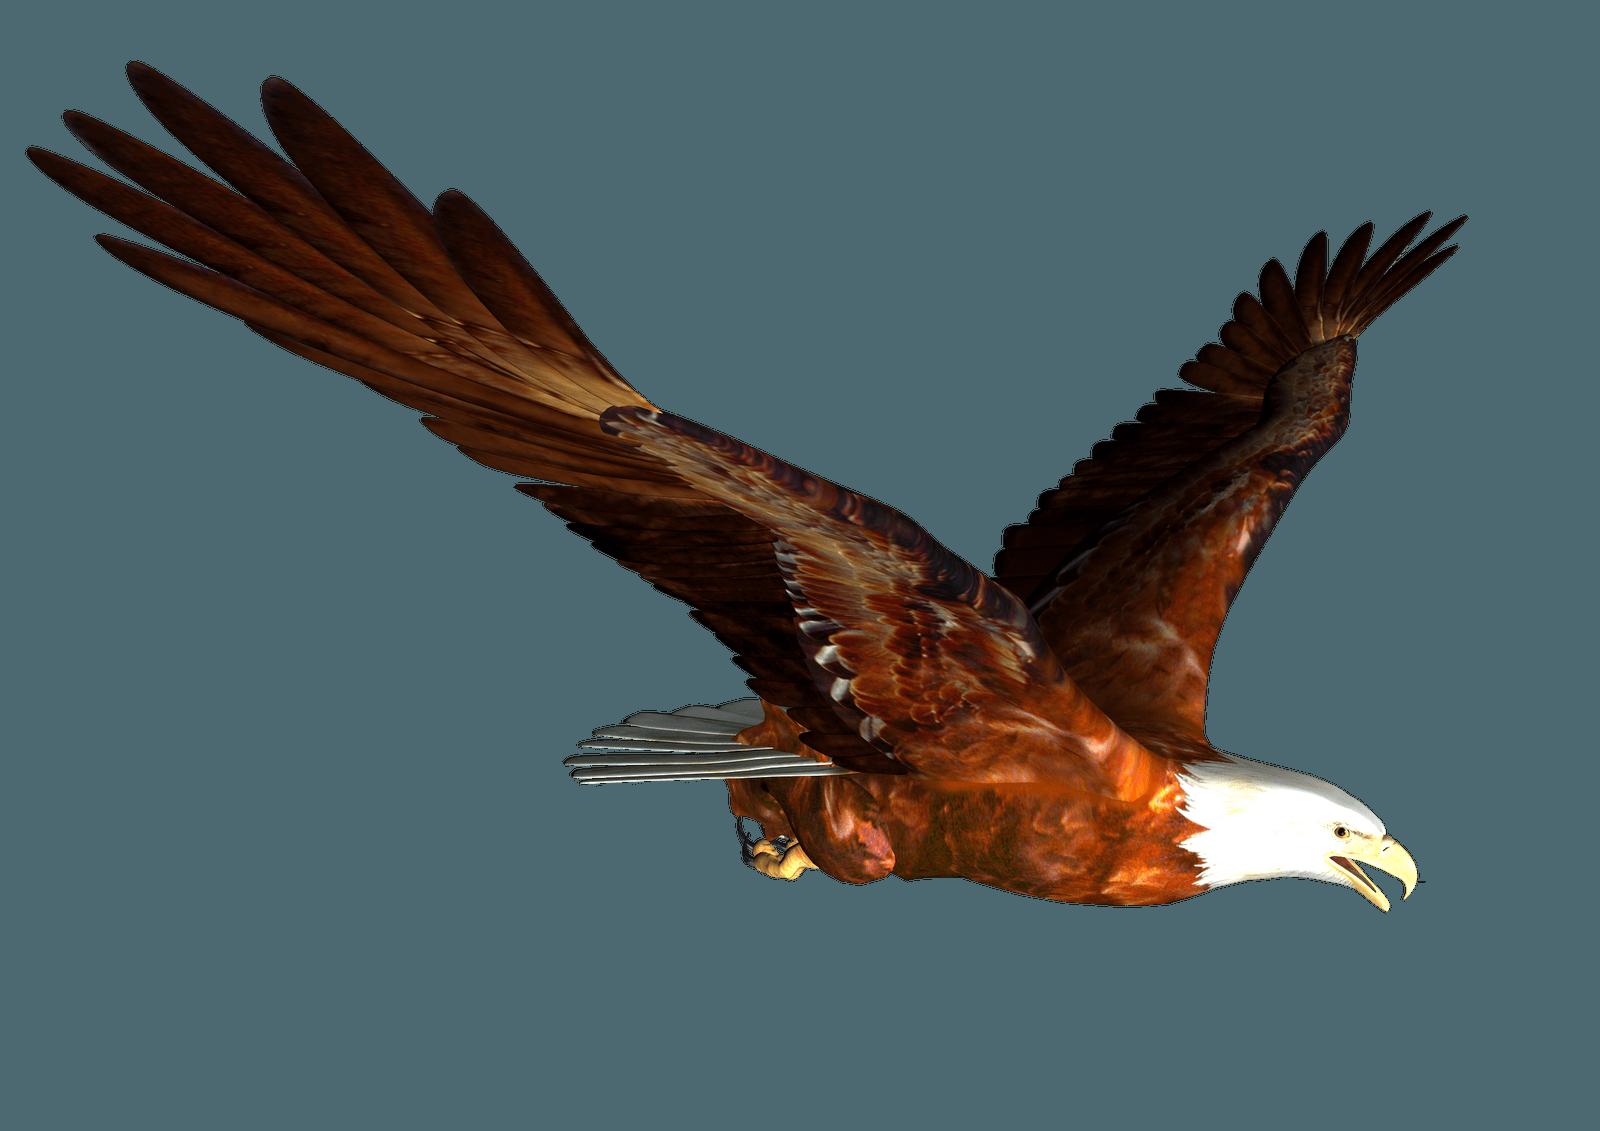 Animated Bald Eagle Flying Png Image Clip Art Pictures Bald Eagle Cartoon Clip Art